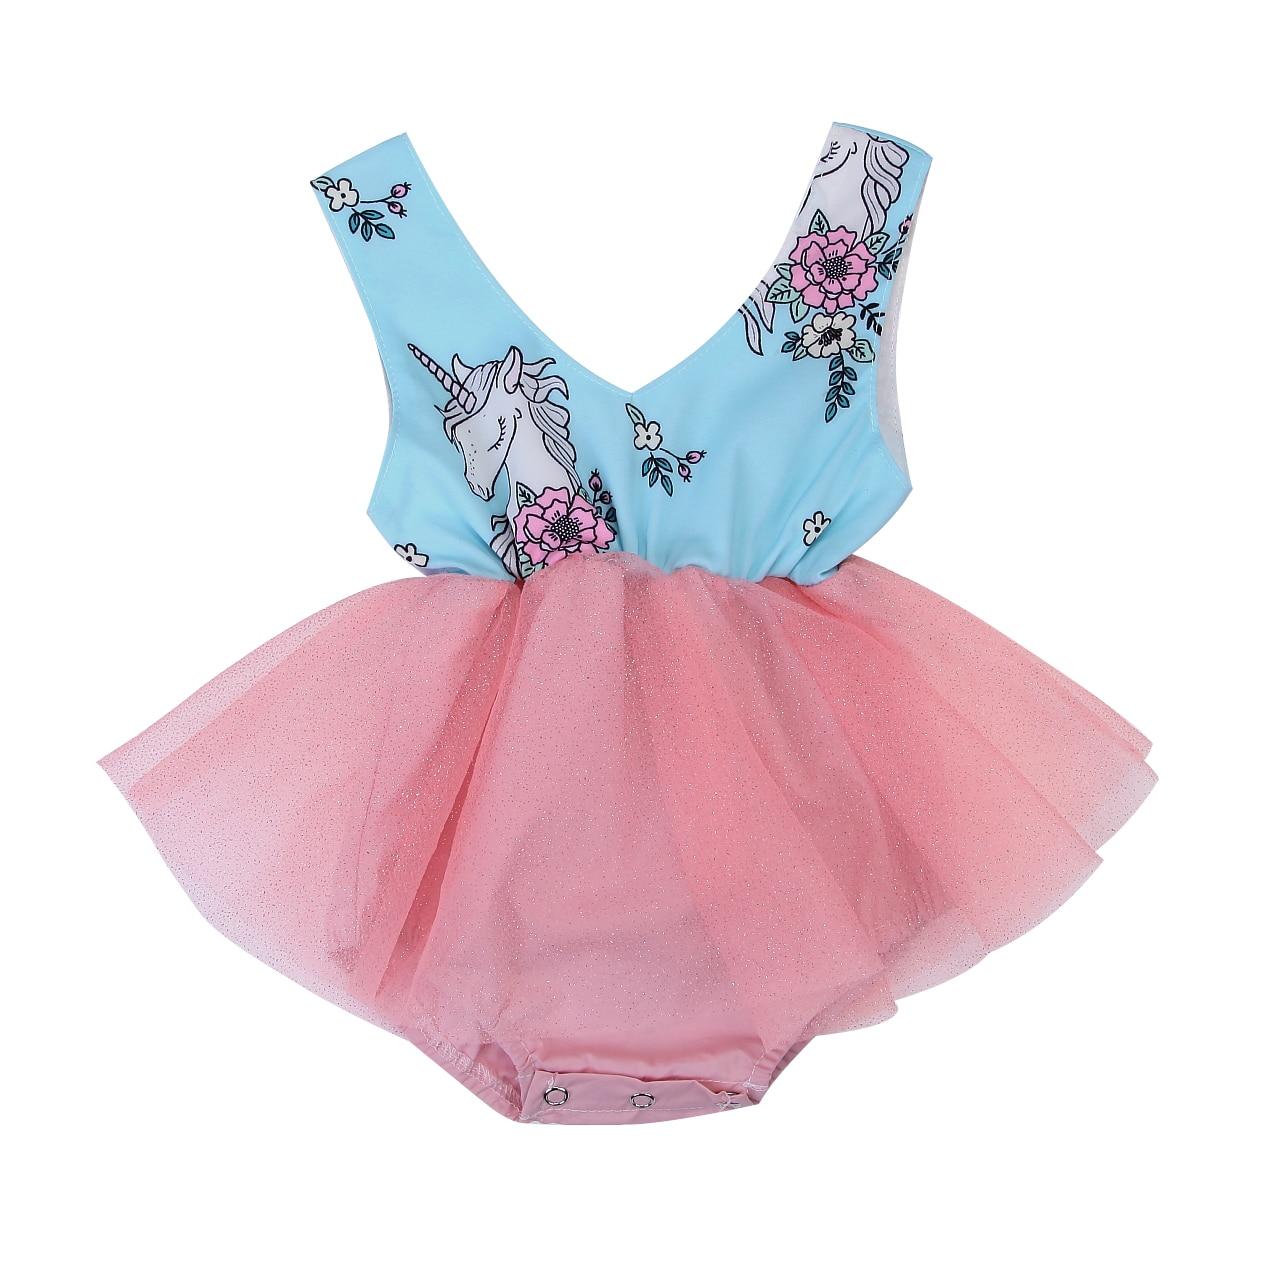 Newborn Baby Girls Kids Unicorn Romper Tulle Lace Tutu ...